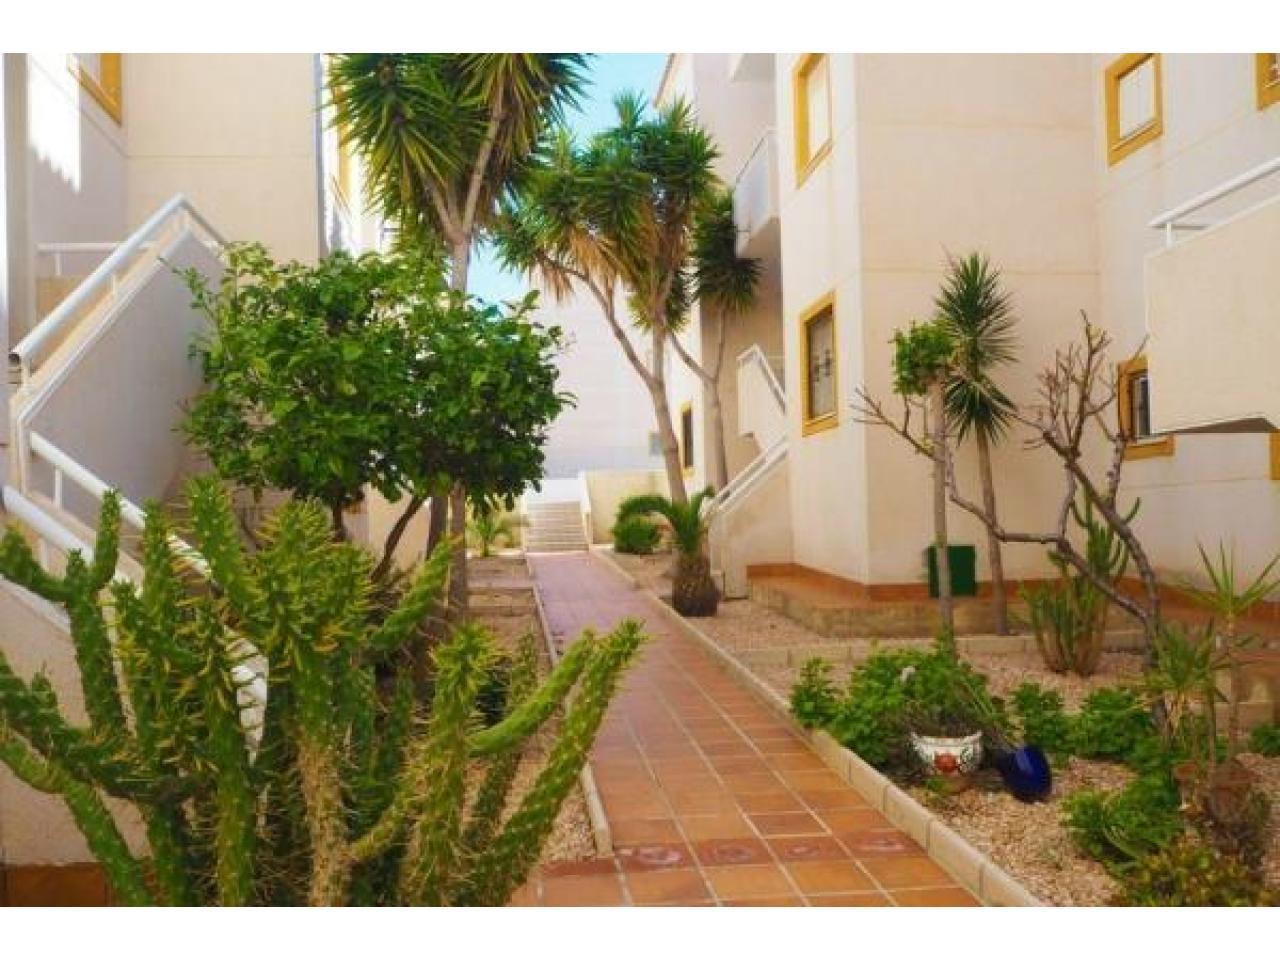 Недвижимость в Испании, Квартира c видами на море в Торревьеха,Коста Бланка,Испания - 5